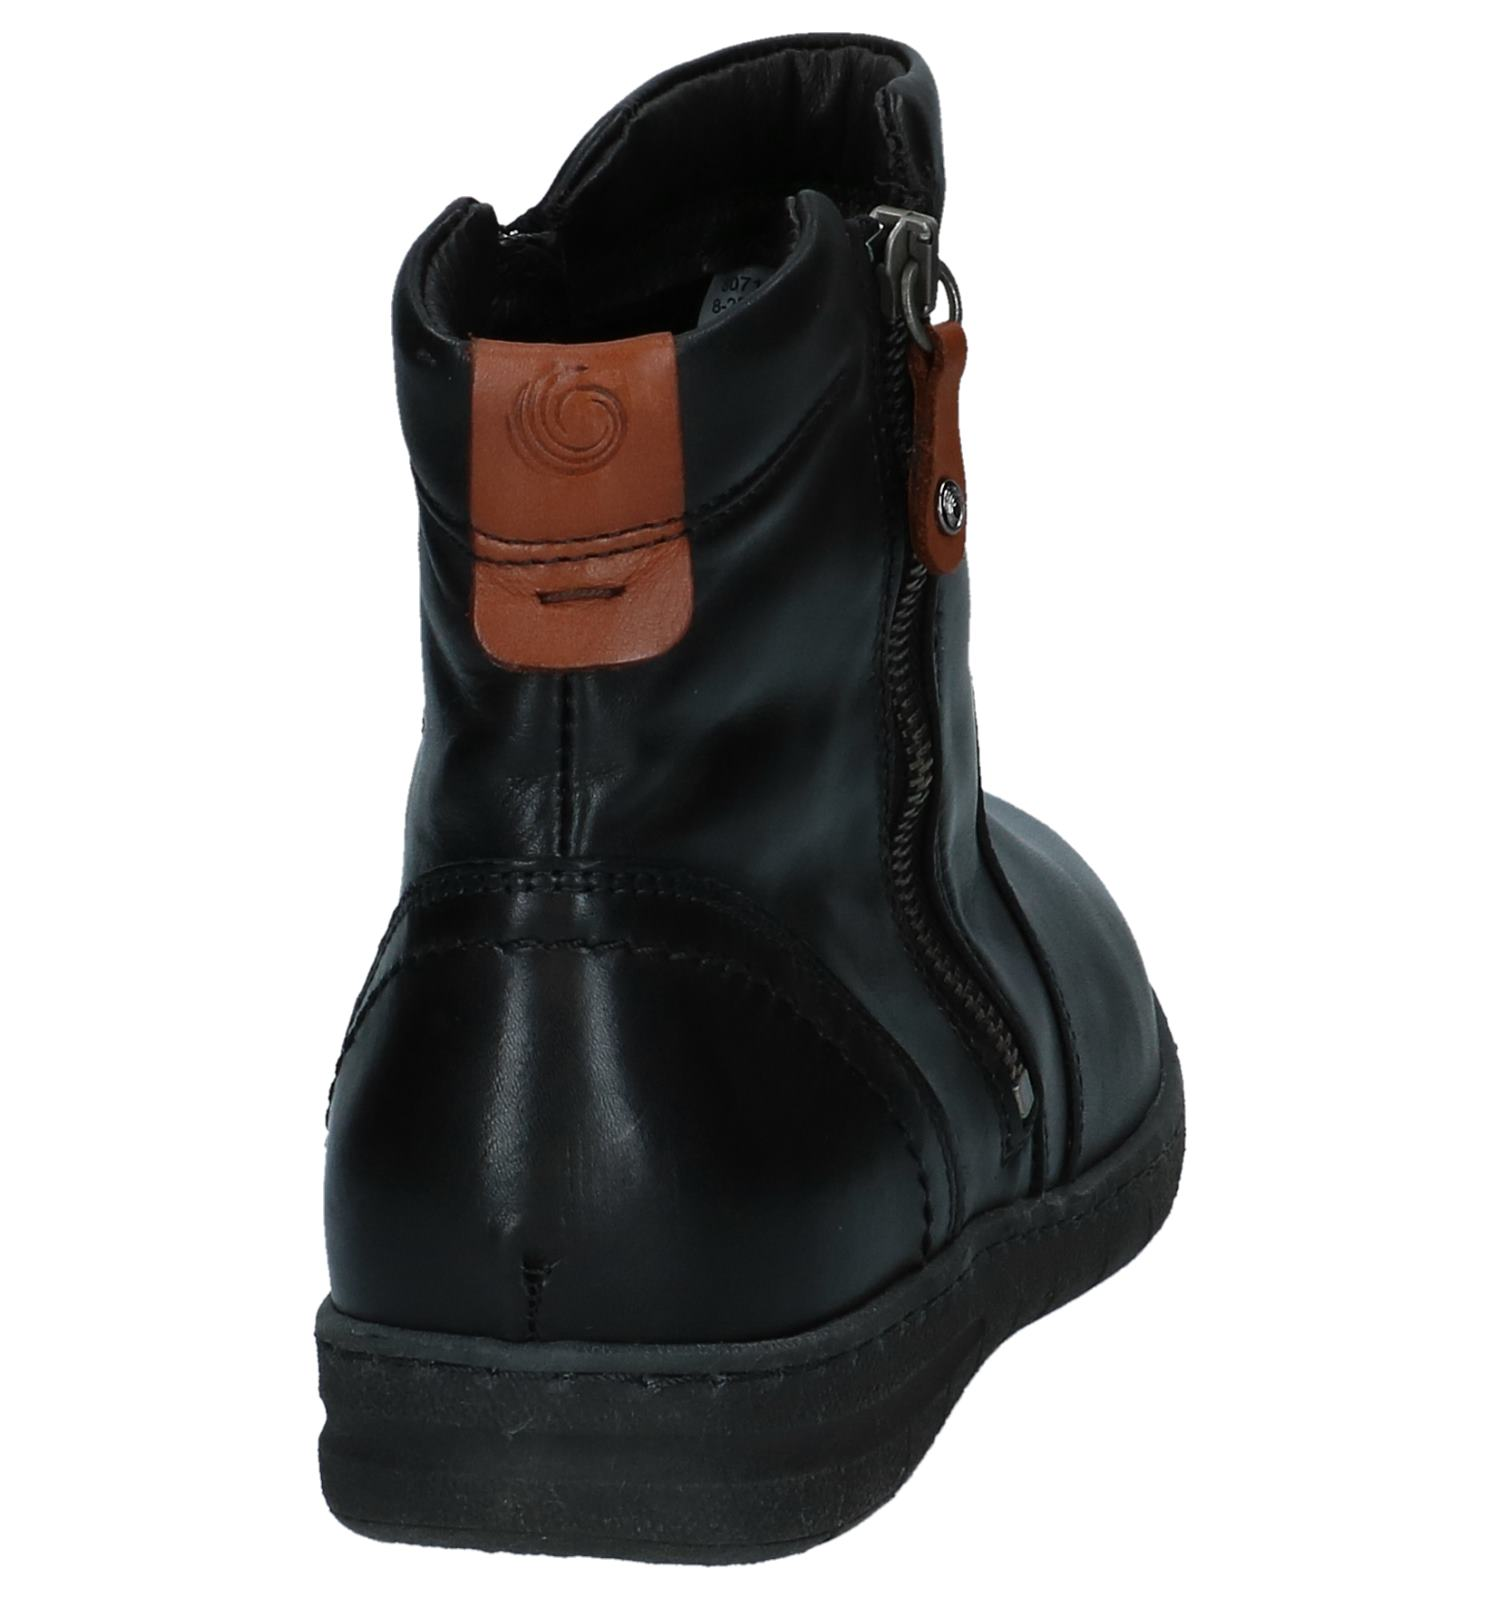 Be Hoge Be Natural Hoge Zwarte Schoenen Natural Zwarte Schoenen ZXiuOPk